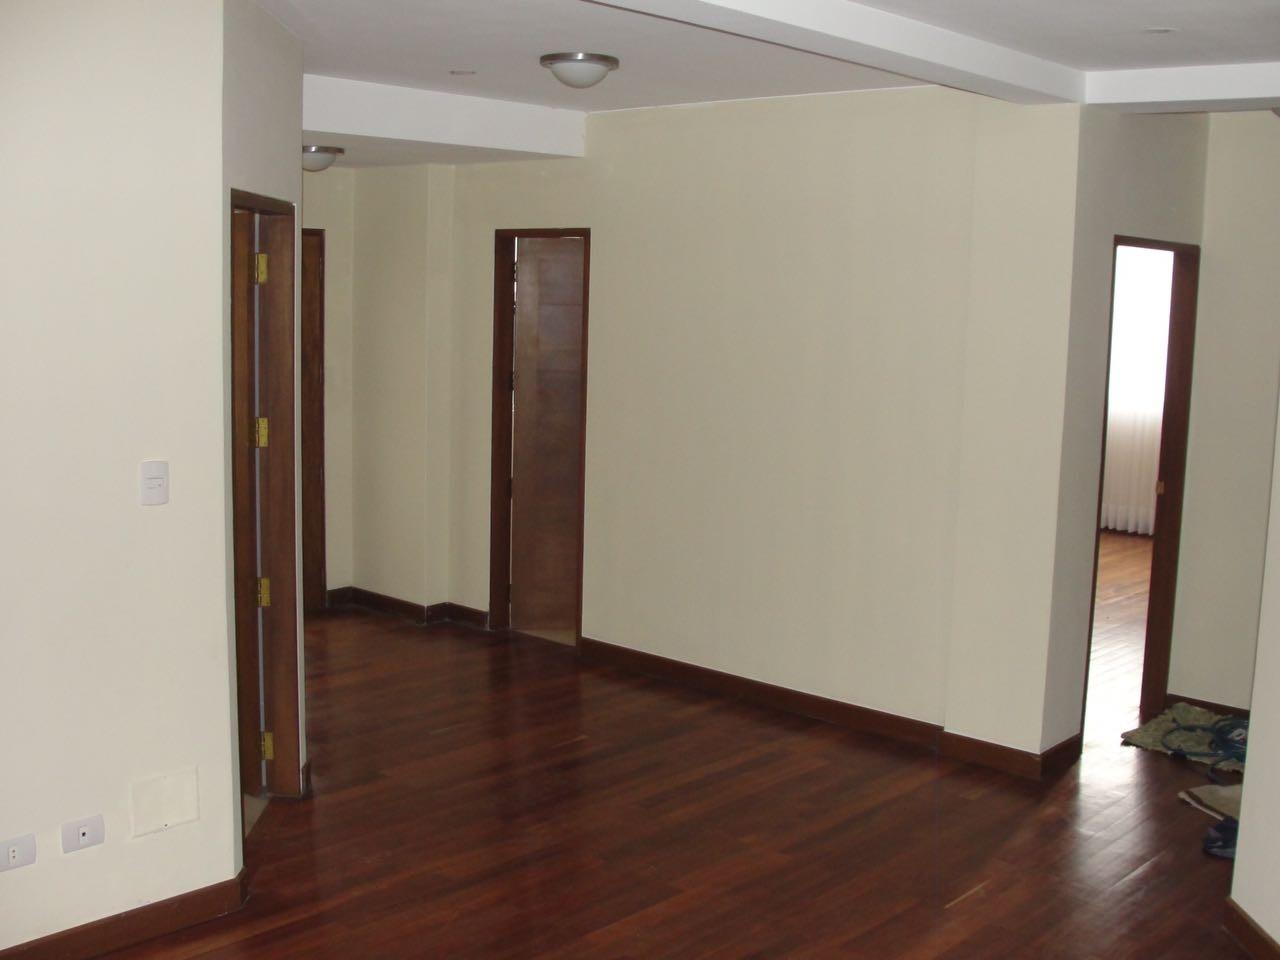 Departamento en Alquiler COTA COTA, BONITO DEPARTAMENTO EN ALQUILER Foto 8